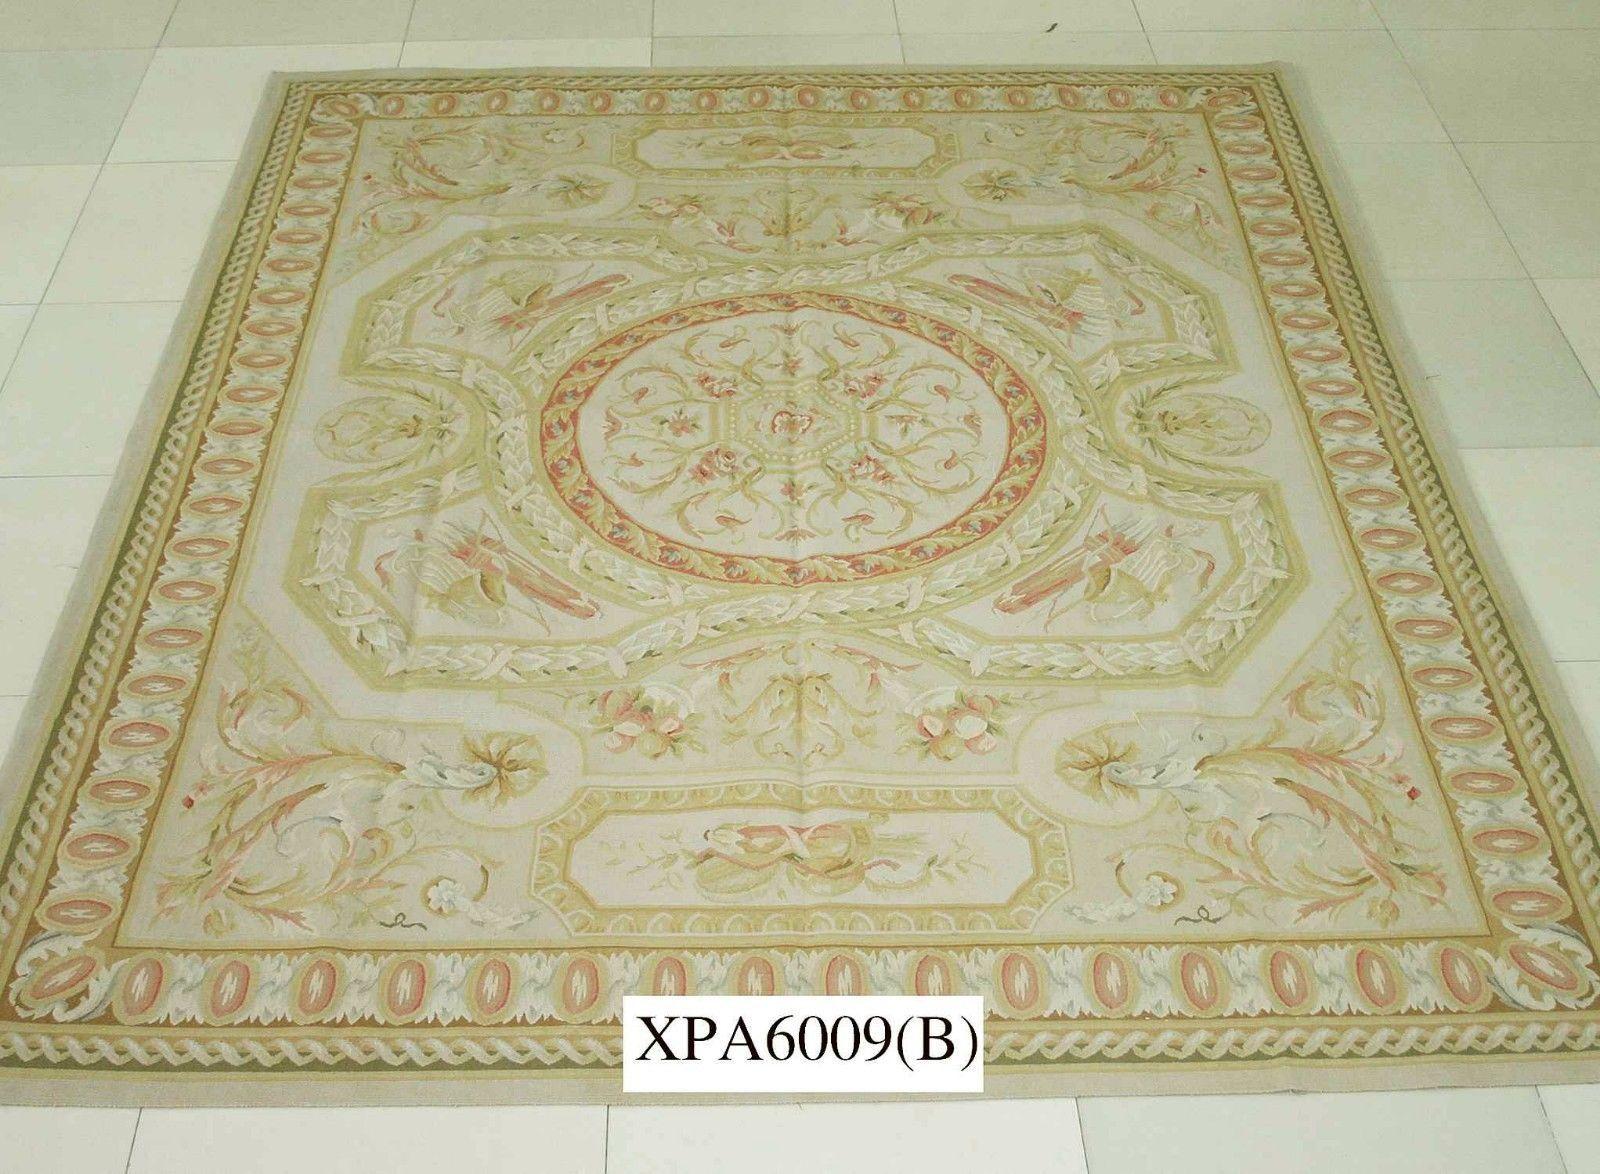 11 9 X18 4 So Stunning Handmade Living Room Decor Huge French Aubusson Wool Rug